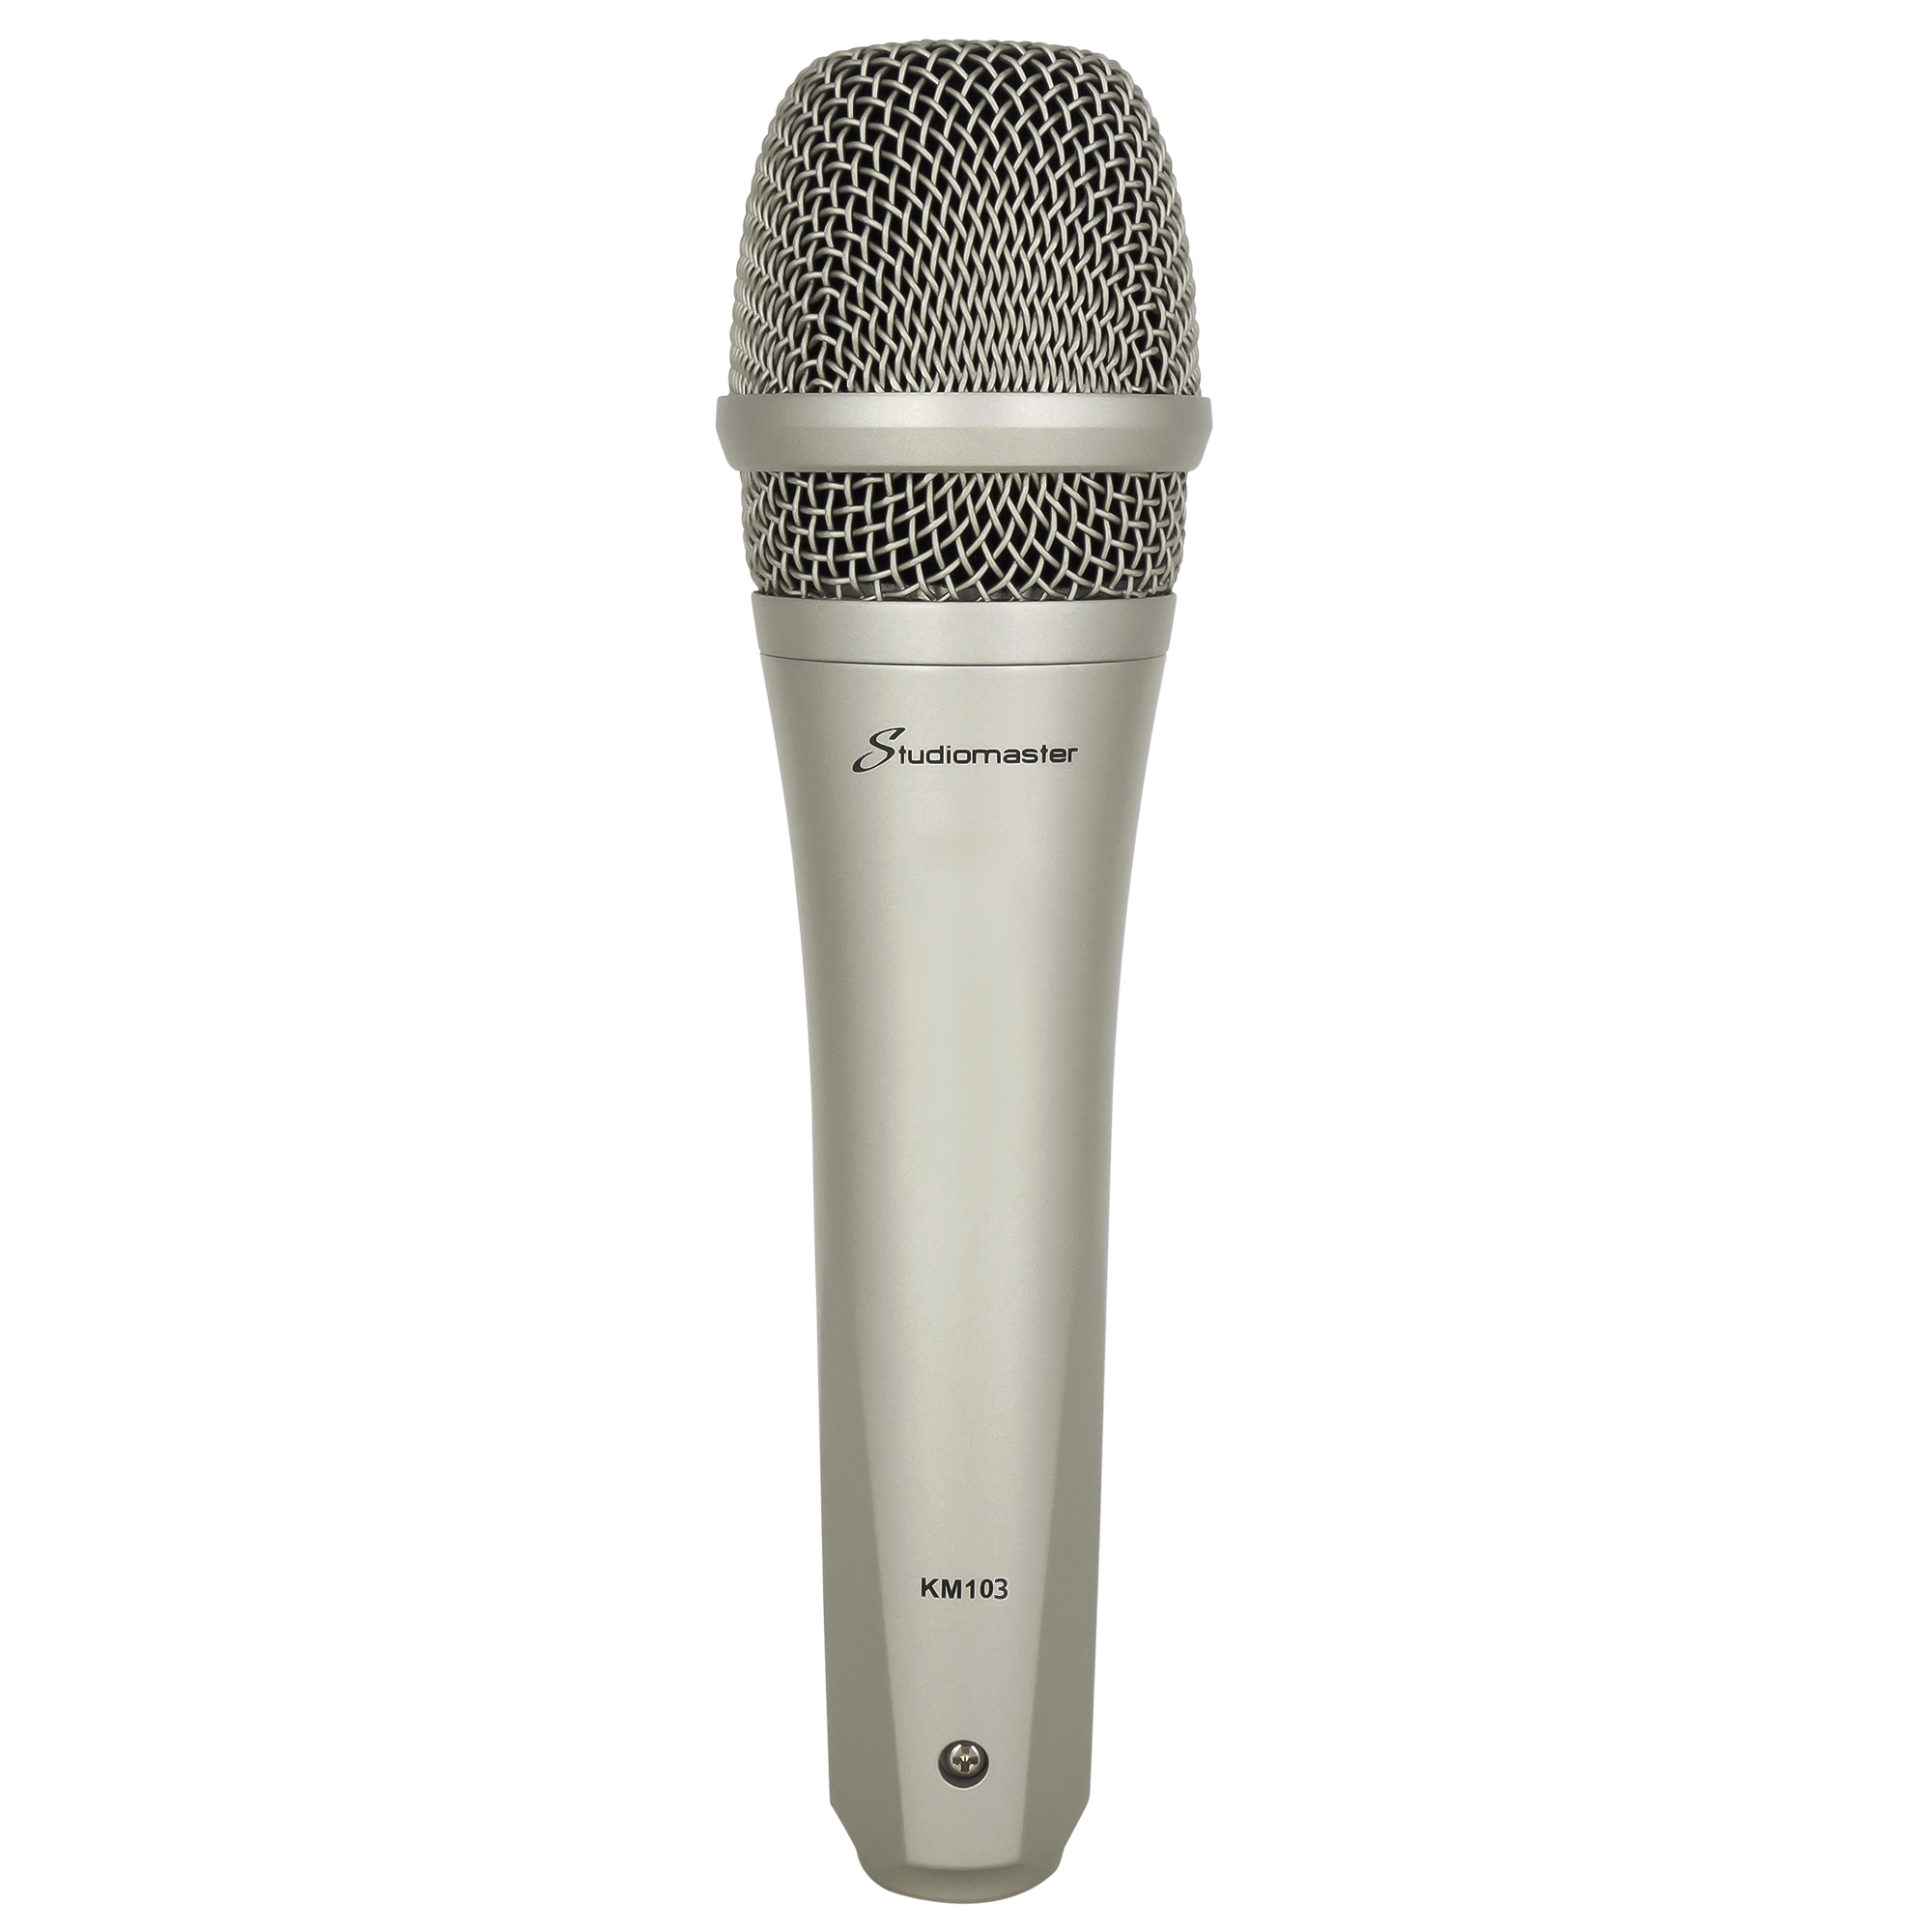 STUDIOMASTER KM103 Dynamic Cardioid USB Microphone.